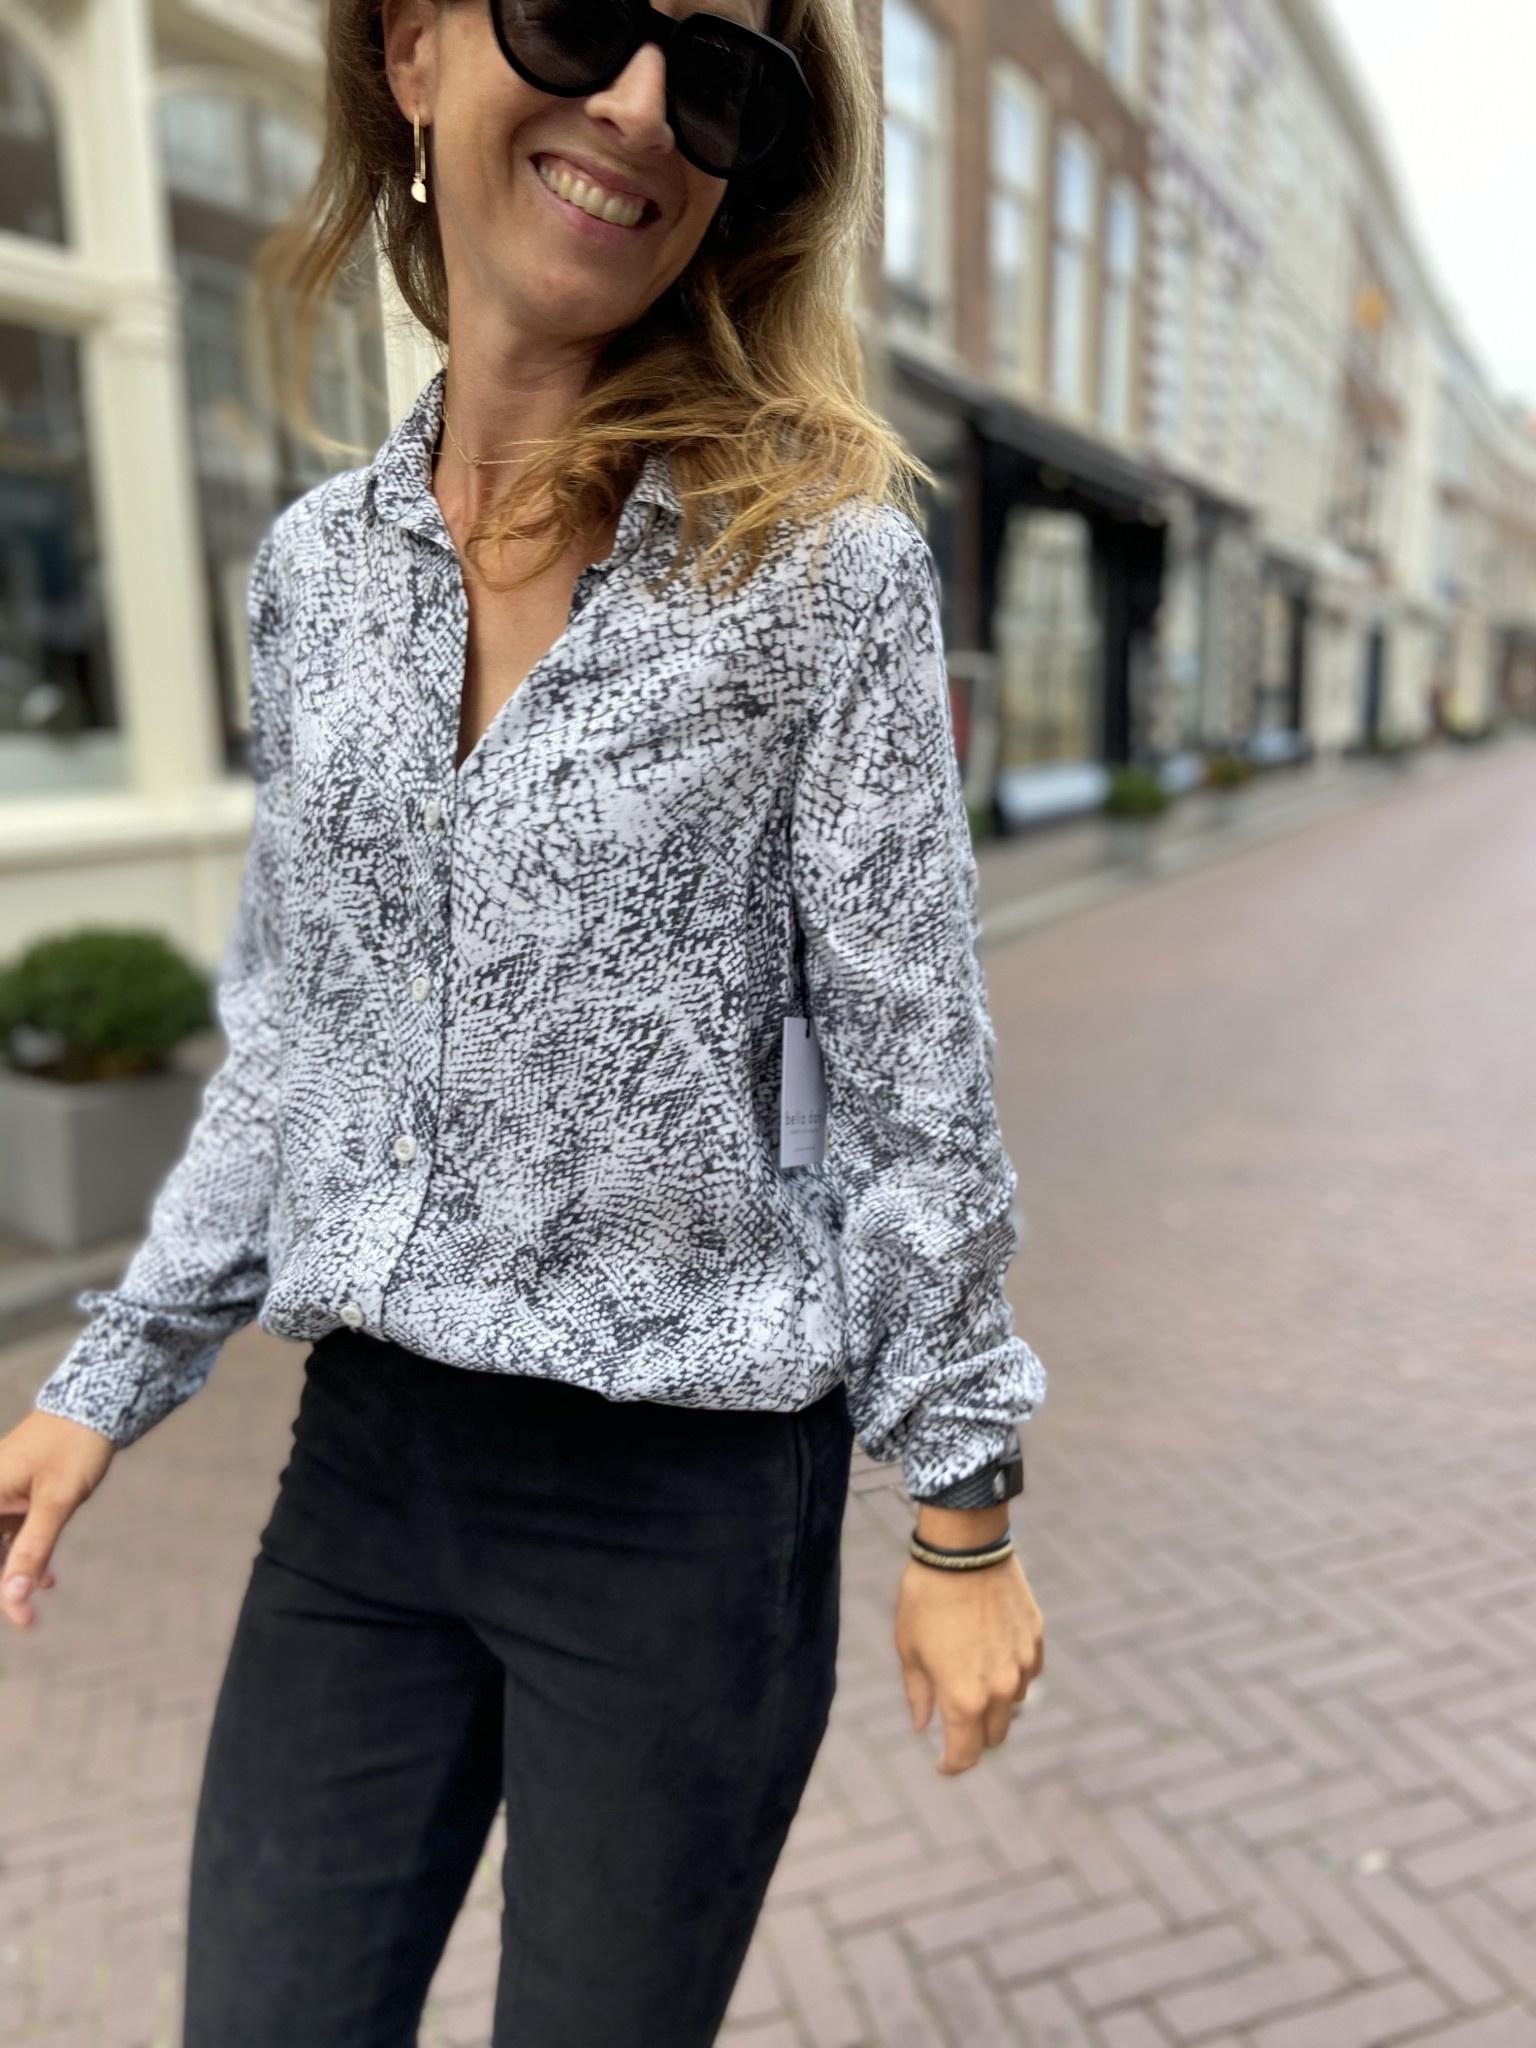 Blouse Bella Dahl Button Down Shirt-1